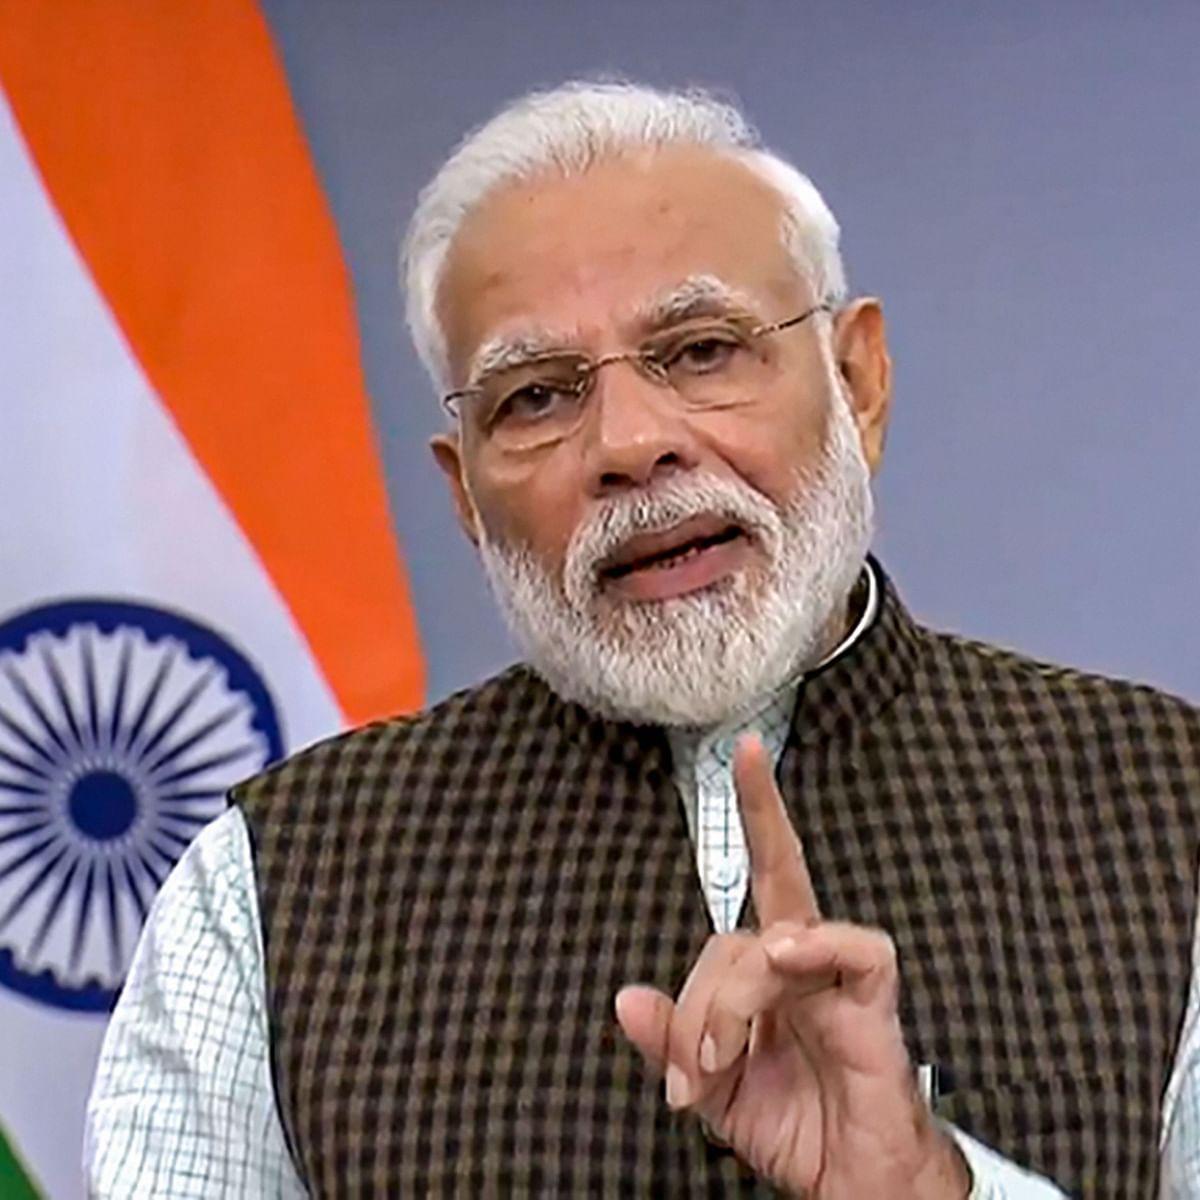 Winter Session Updates: PM Modi to address Rajya Sabha at 2 pm, says PMO